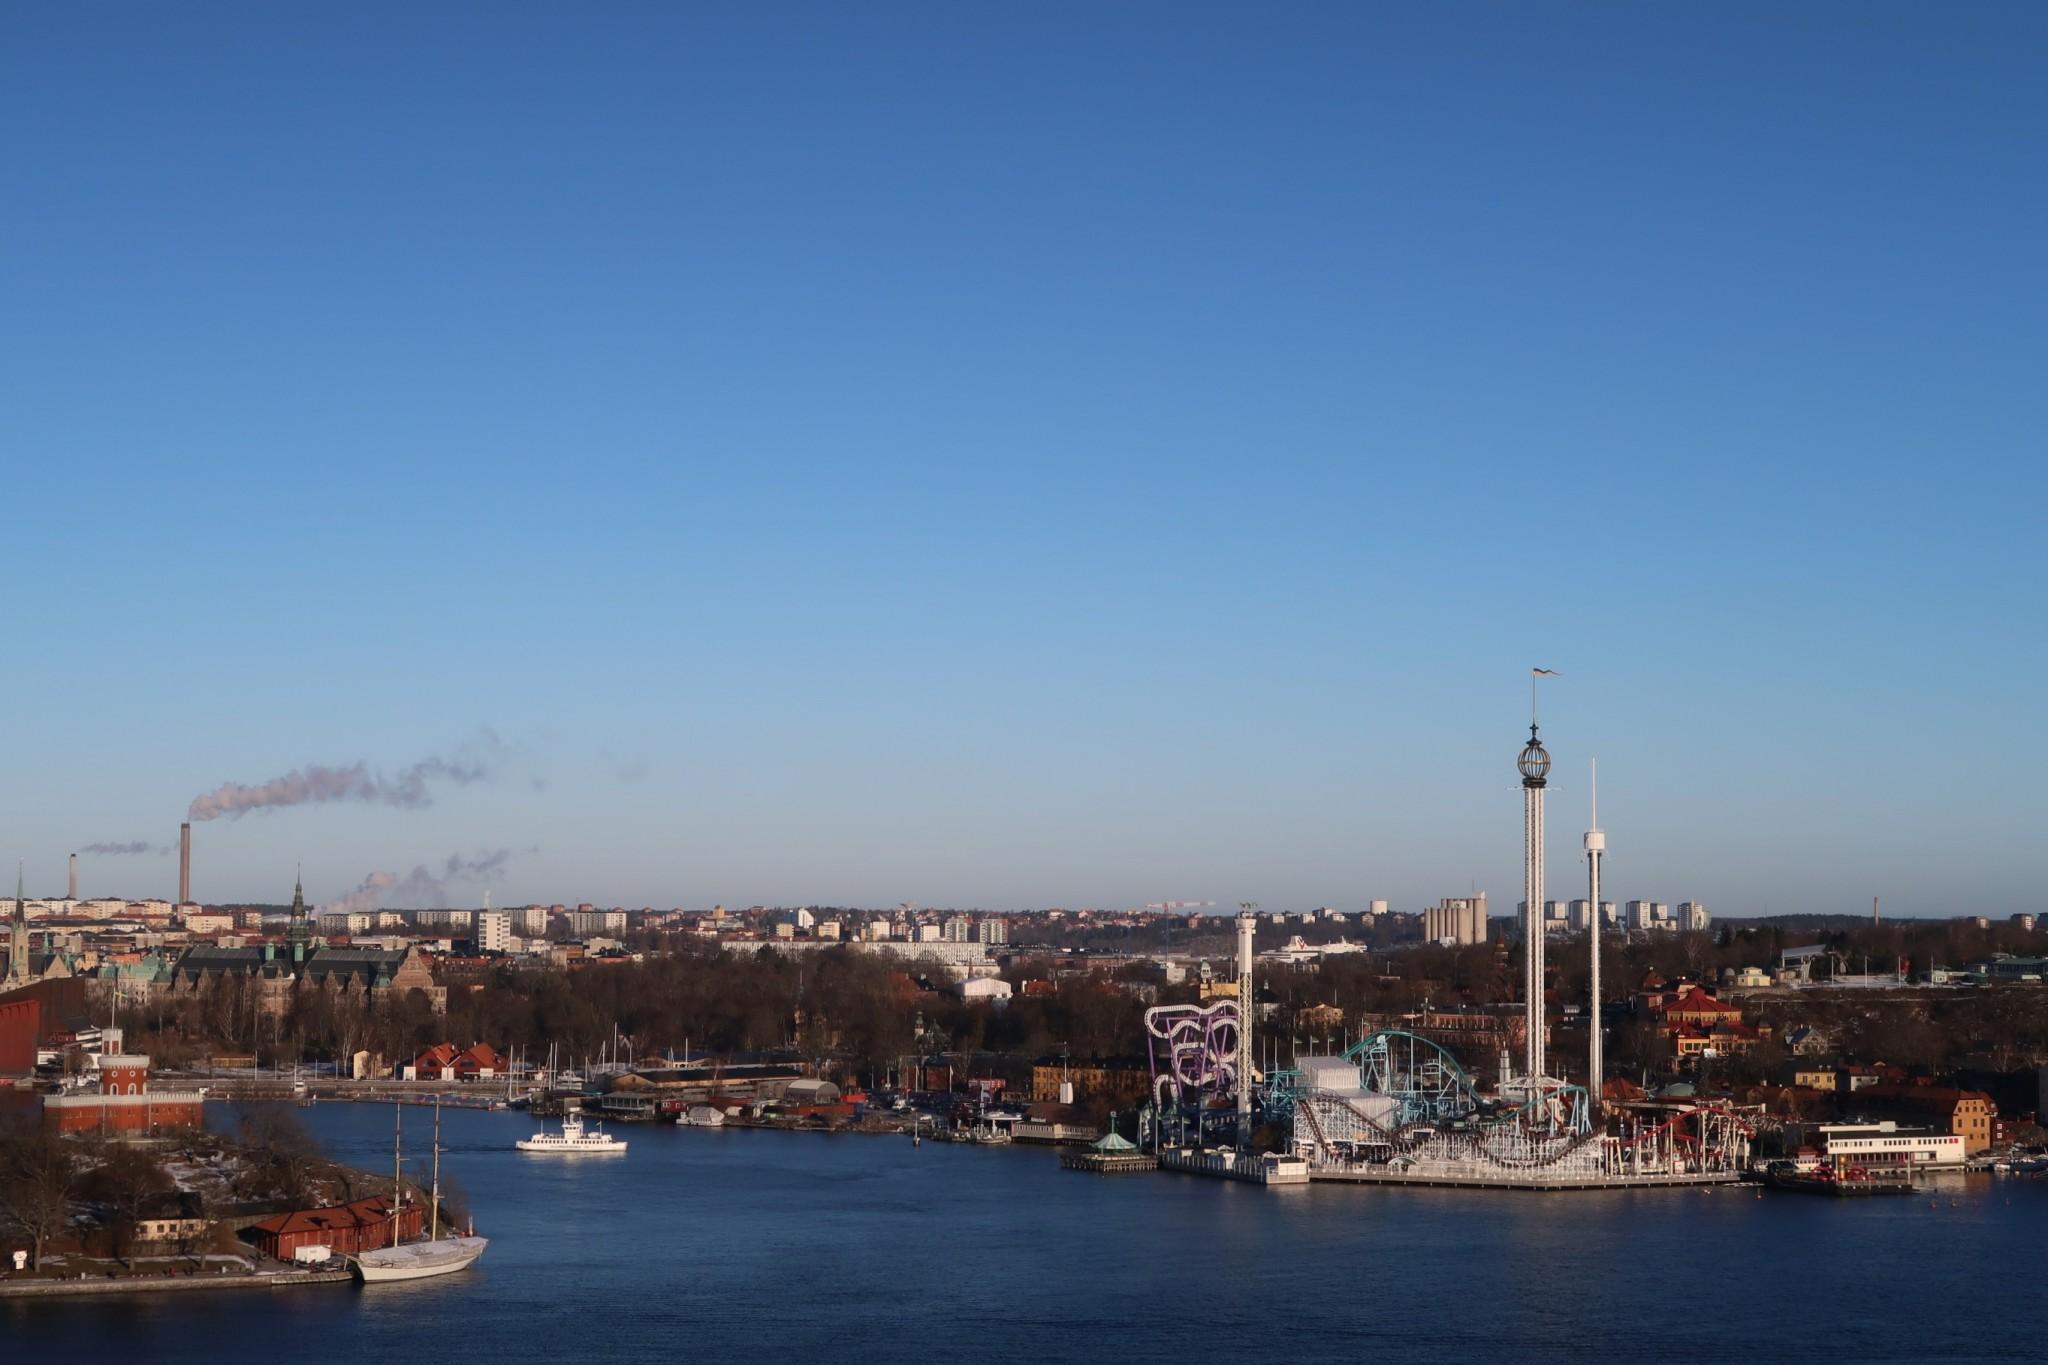 Tukholma Södermalm